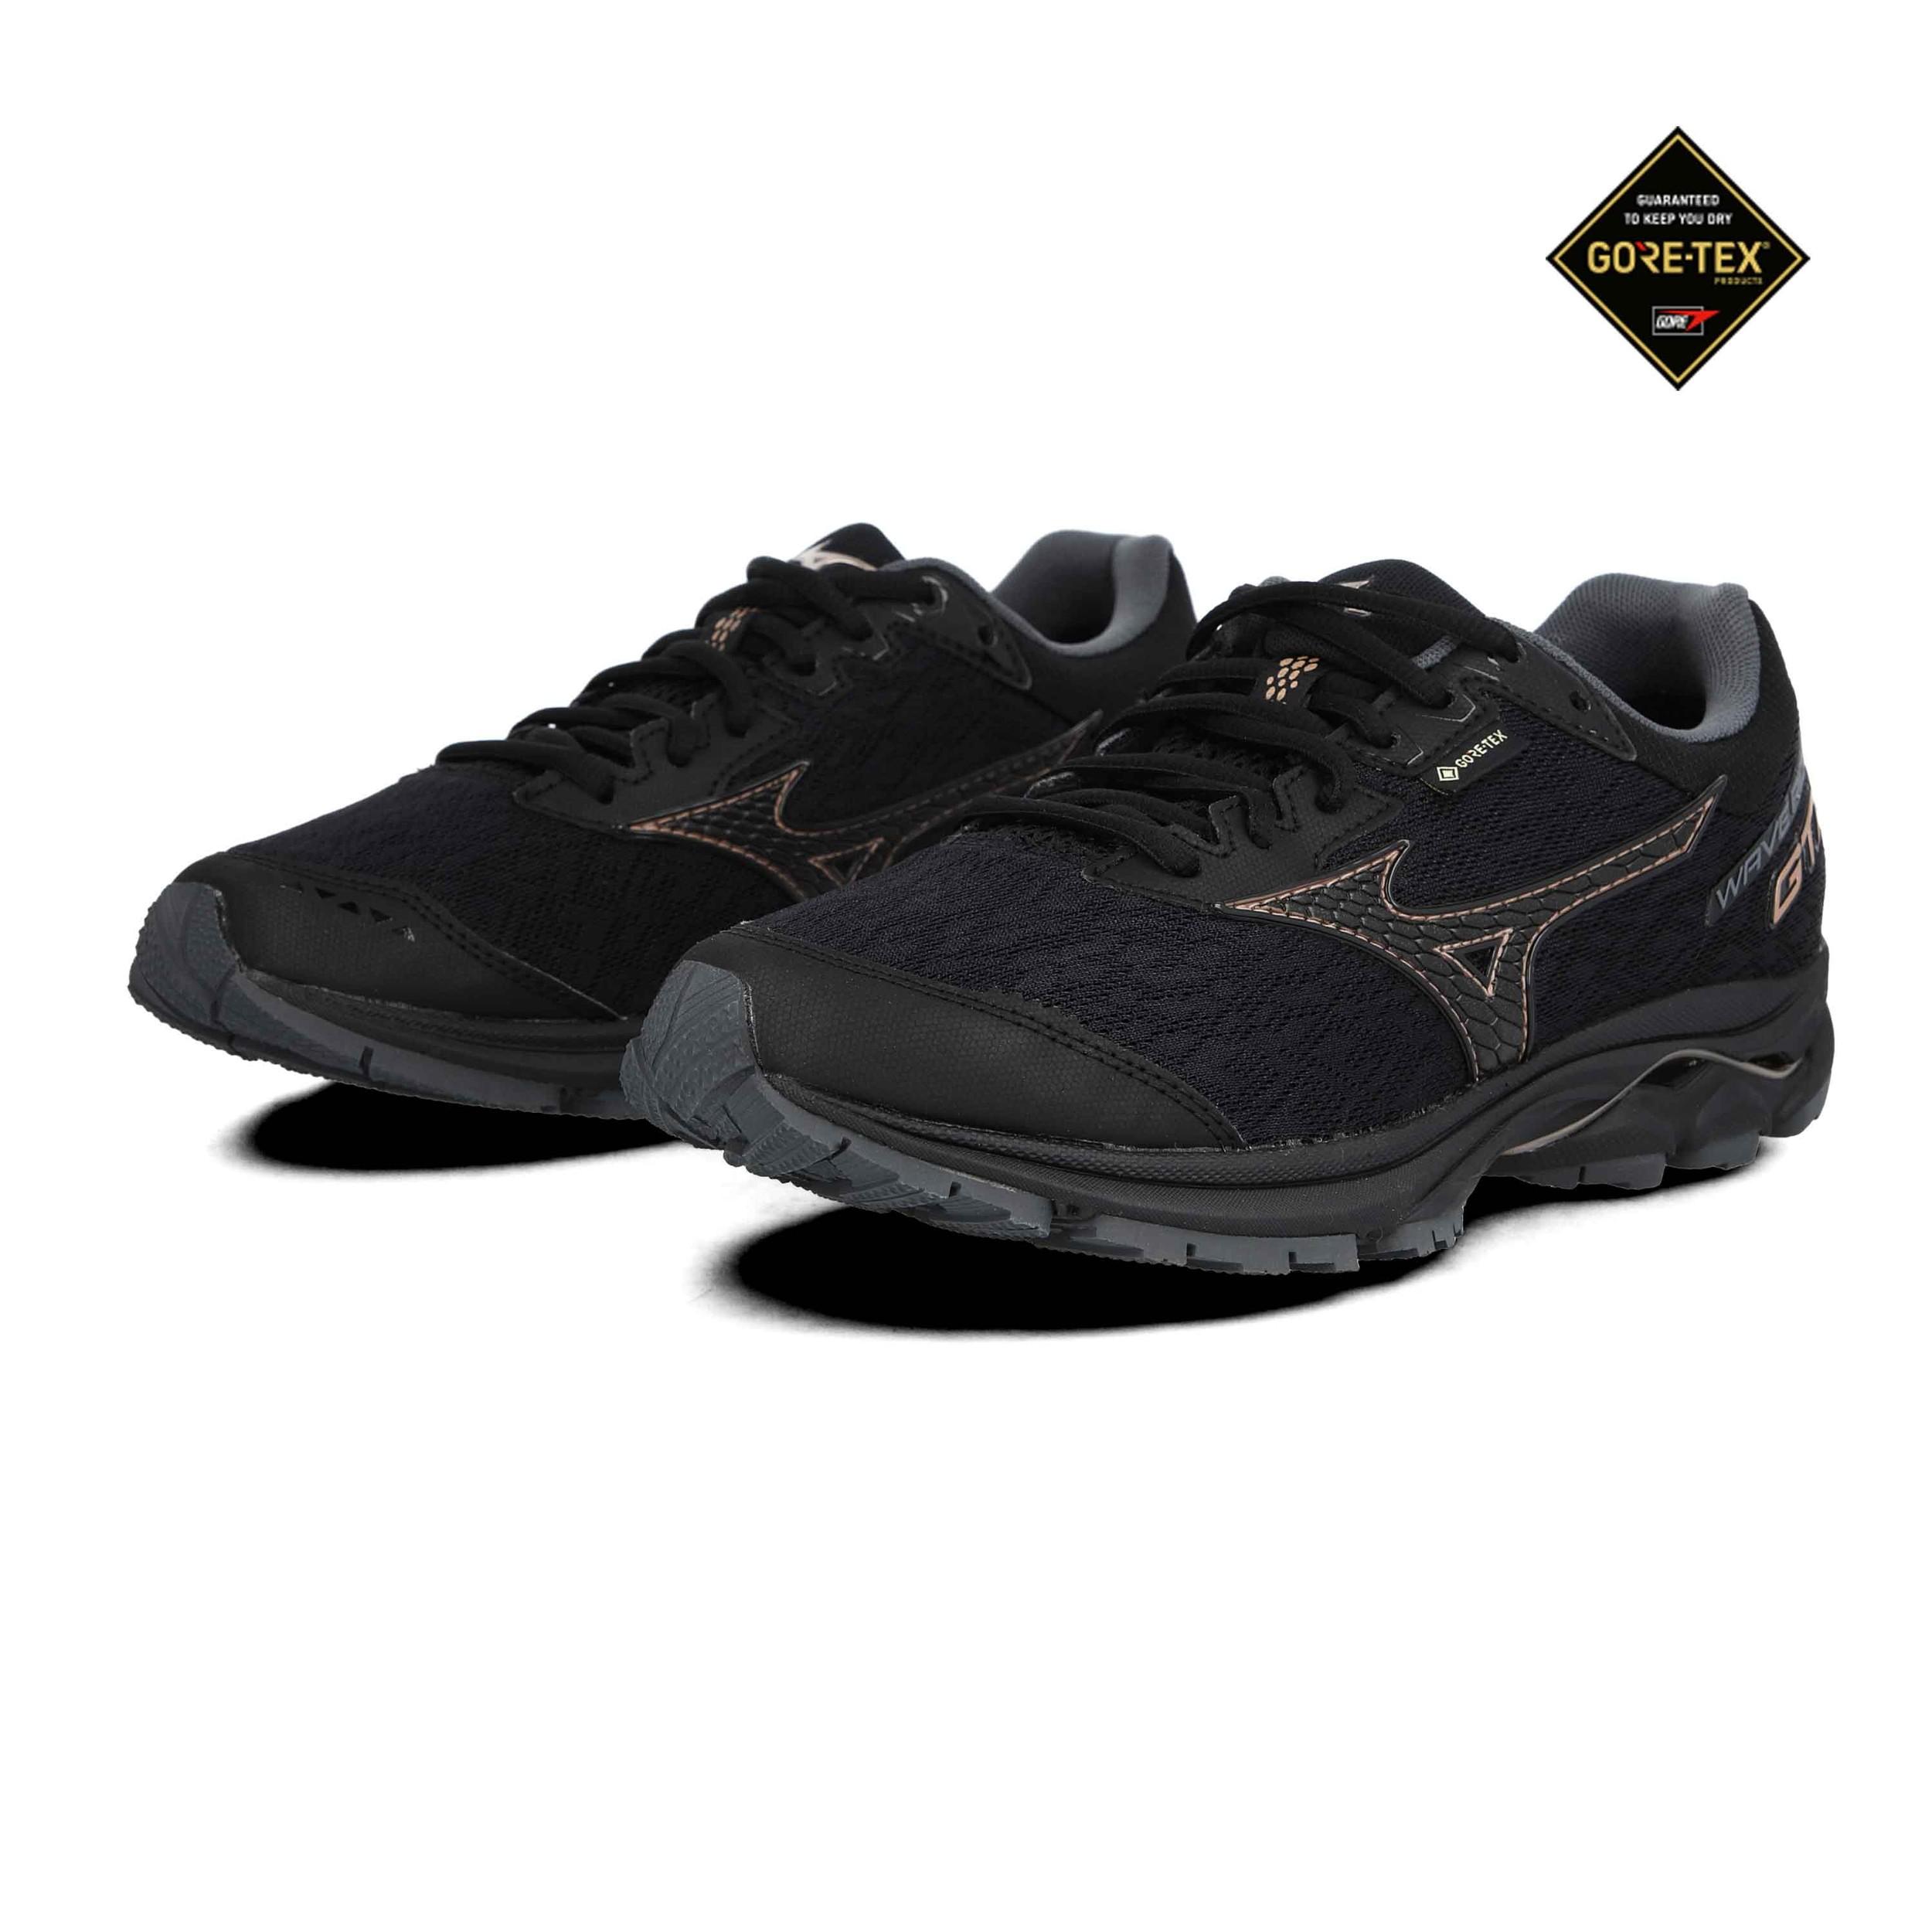 Mizuno Wave Rider GORE-TEX Women's Trail Running Shoes - SS20